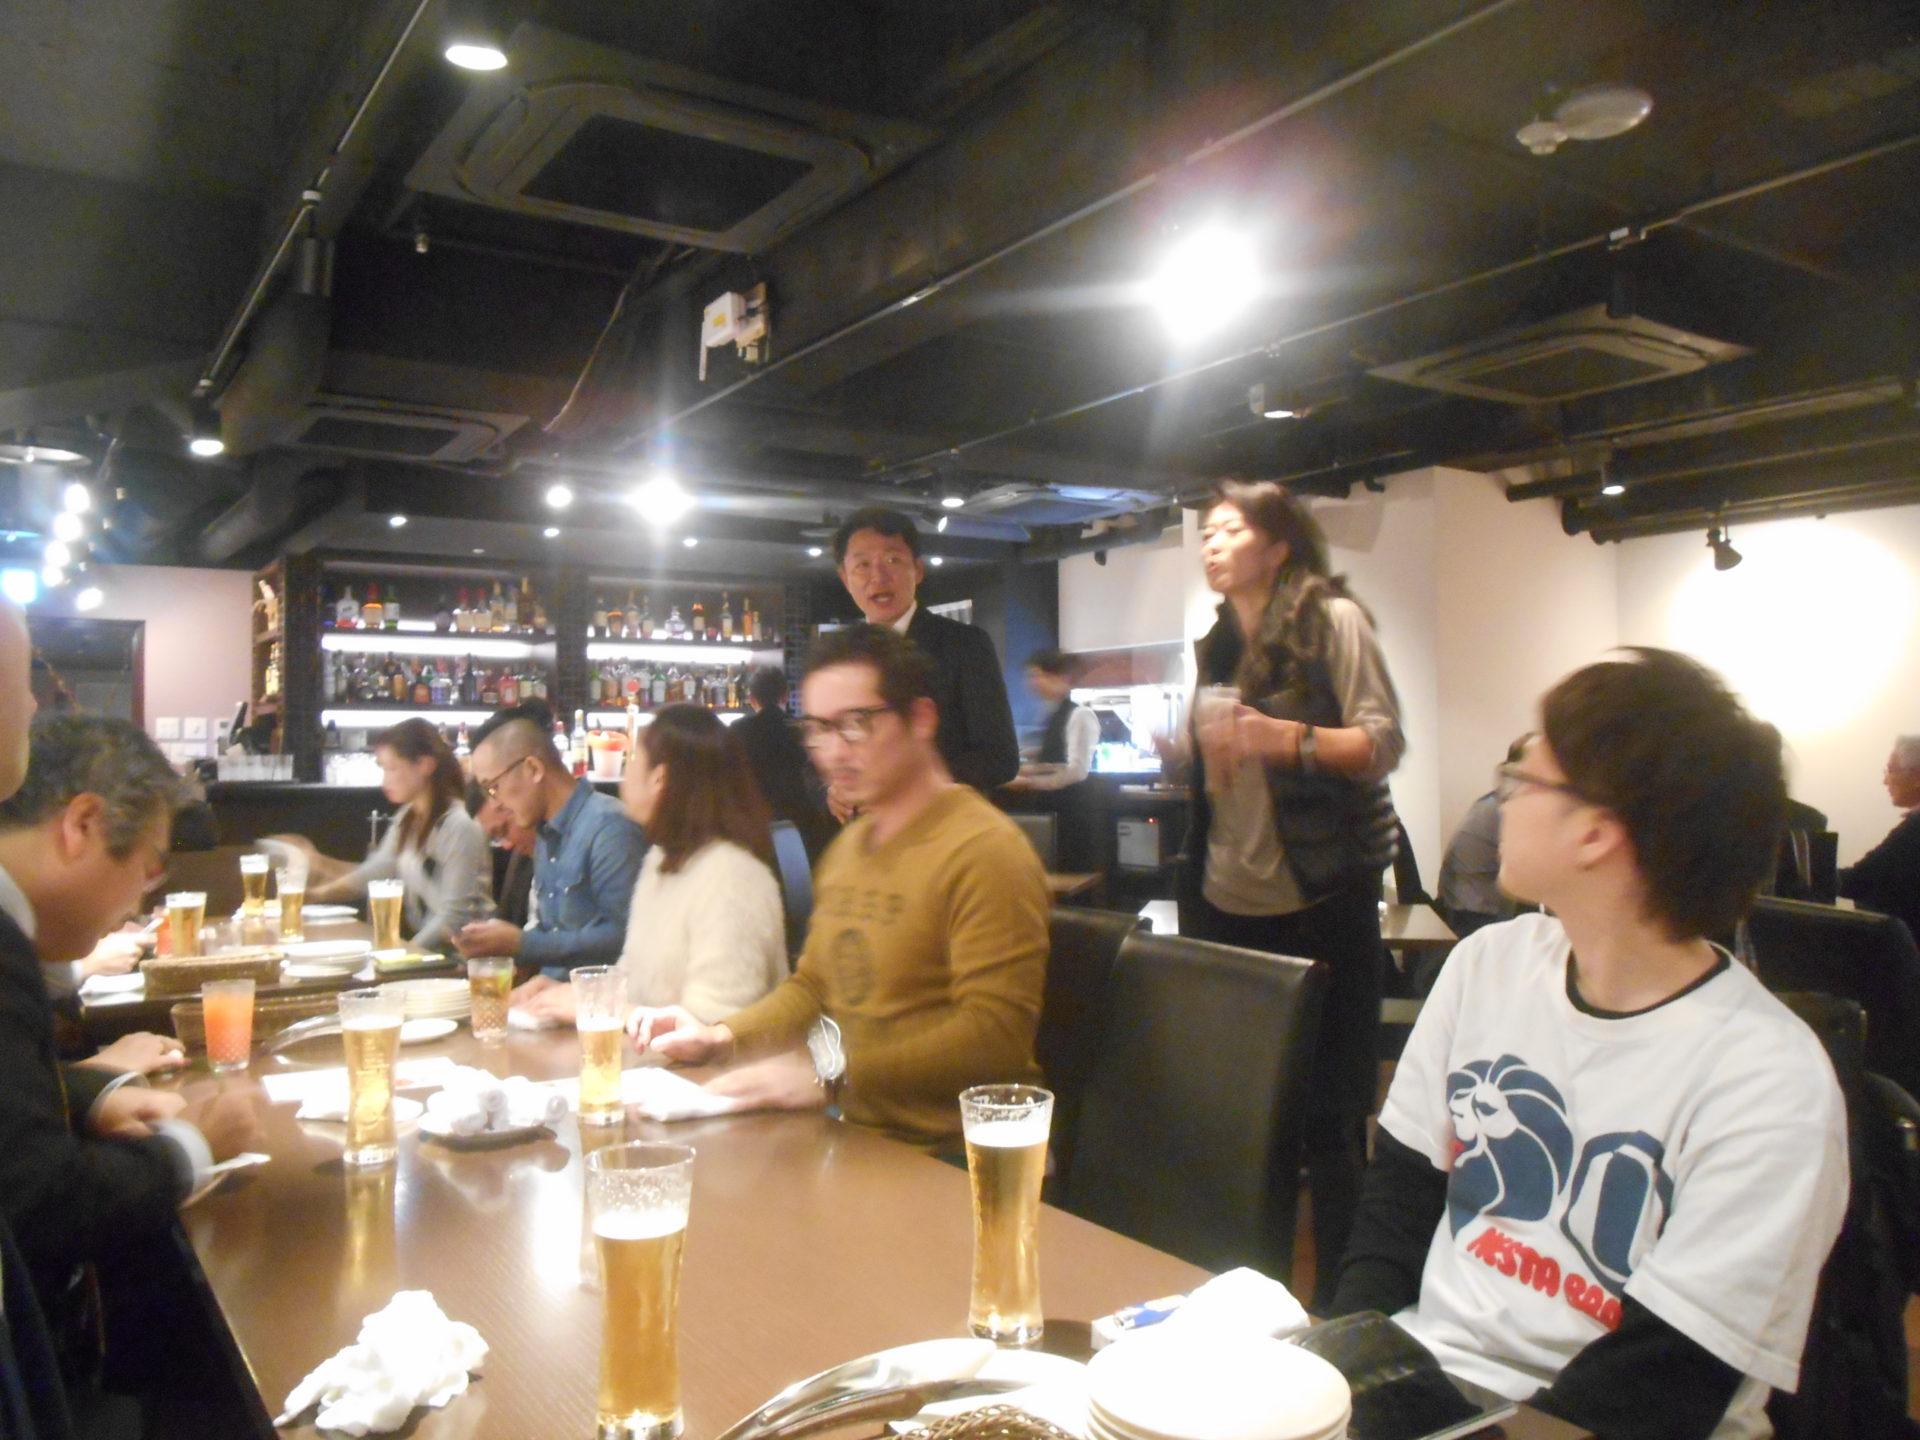 DSCN0298 1920x1440 - 2015年11月16日(月) AOsuki定例飲み会開催致しました。